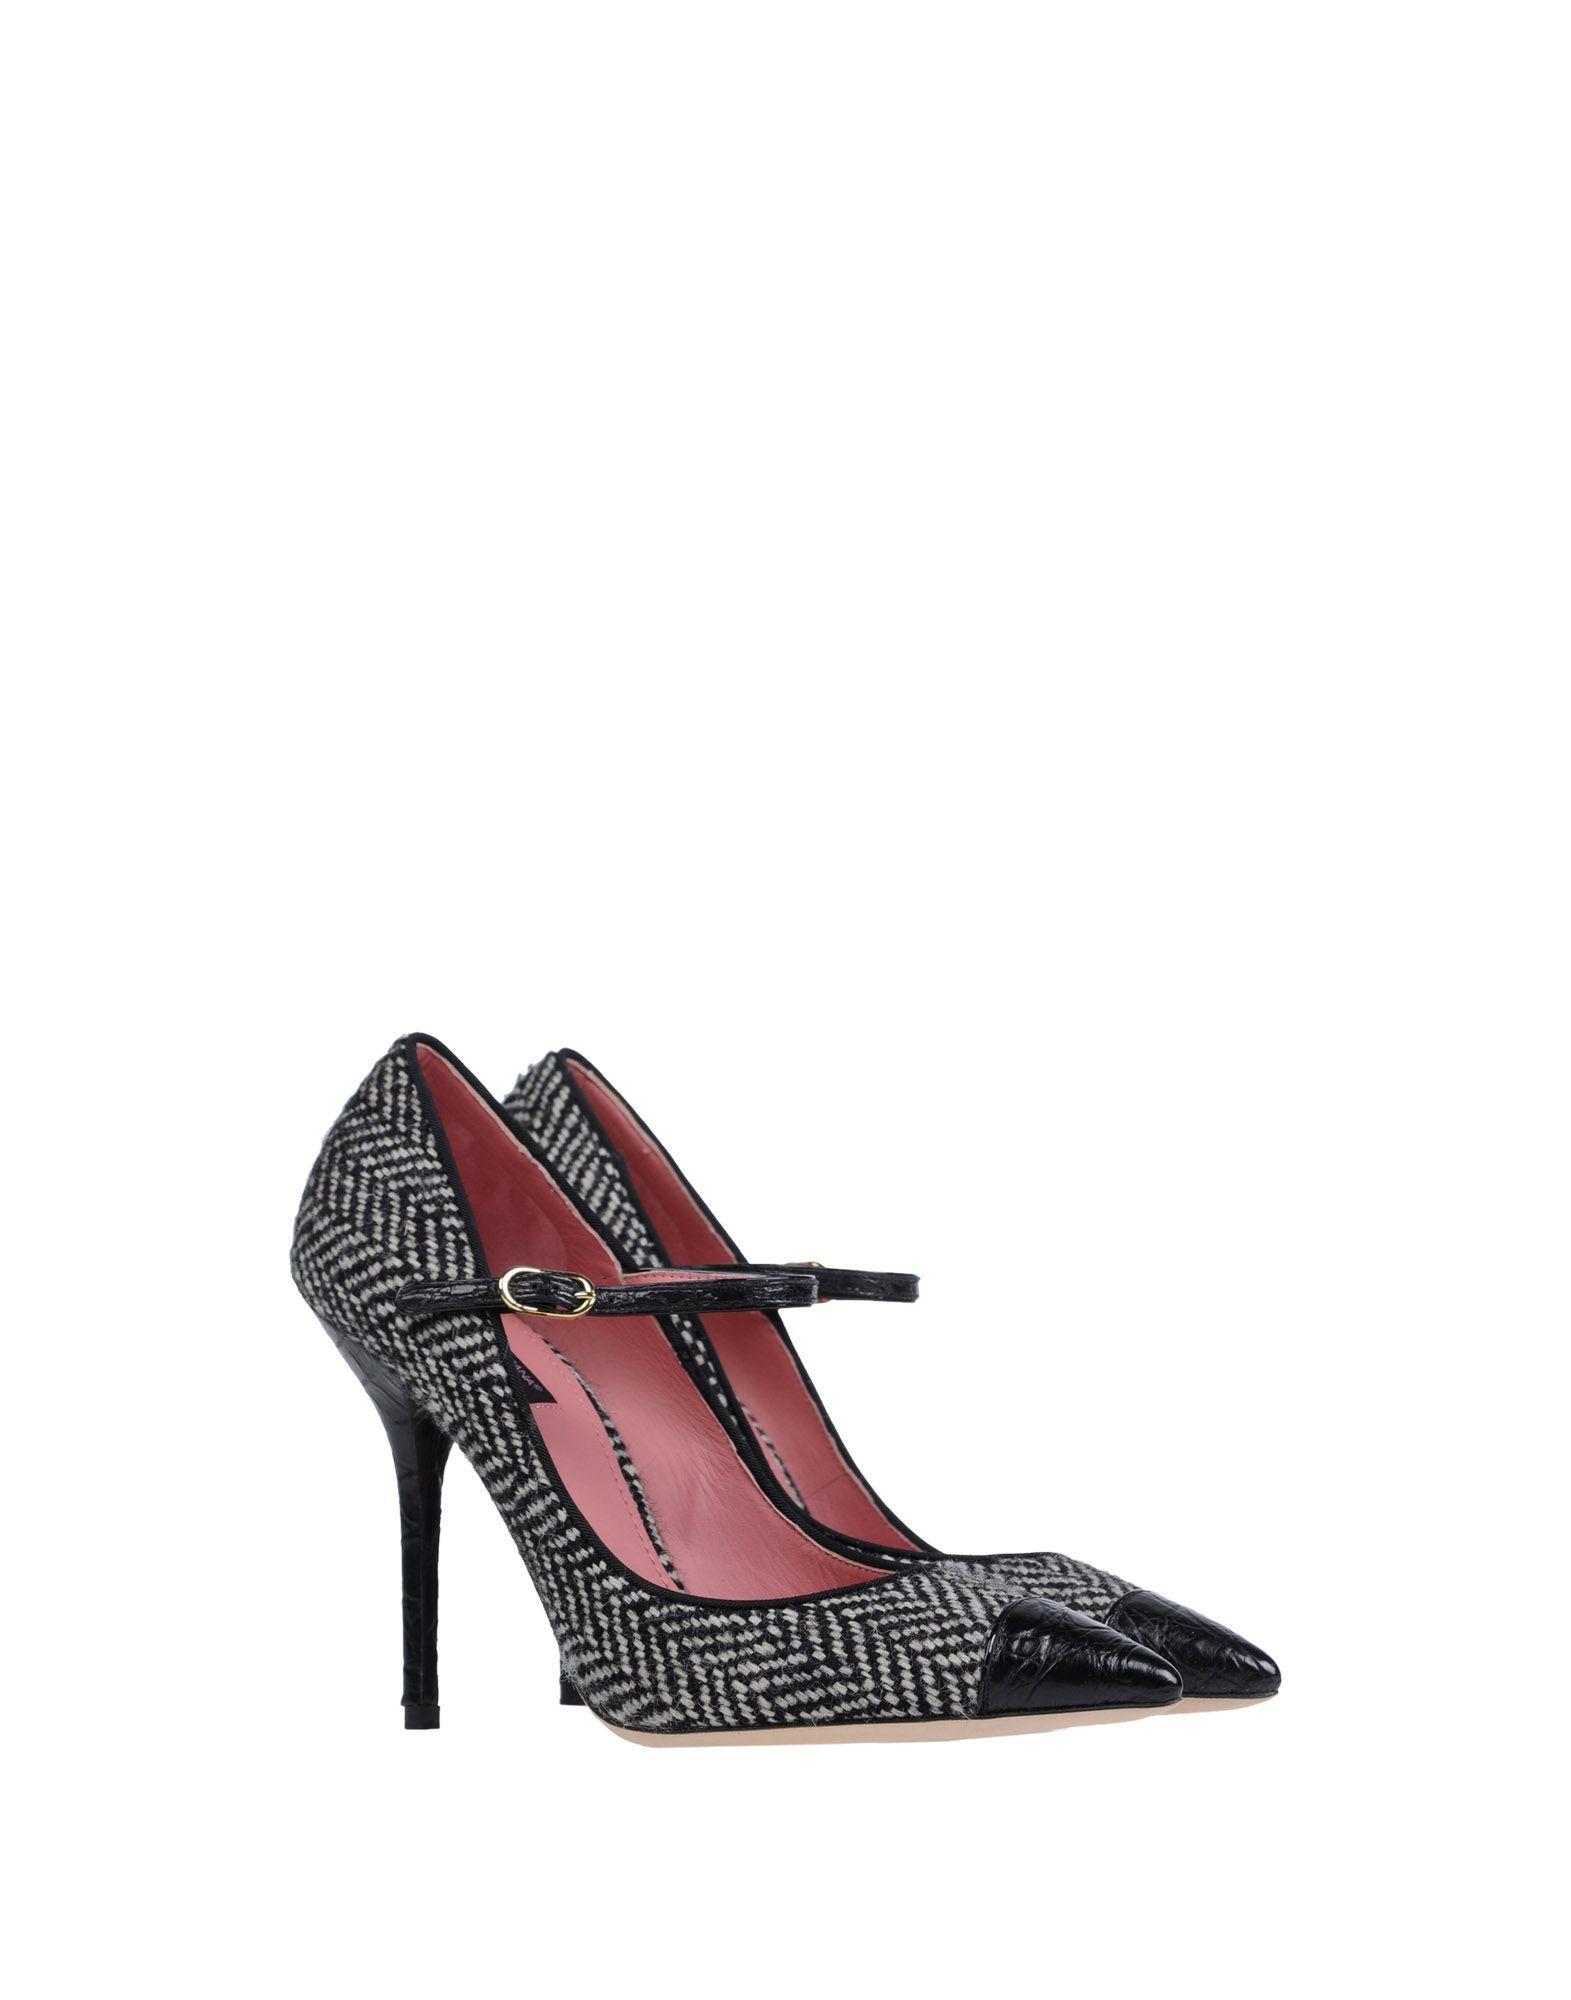 e6f7b776419d72 Dolce   Gabbana Pump - Women Dolce   Gabbana Pumps online on YOOX United  States - 11147777QA